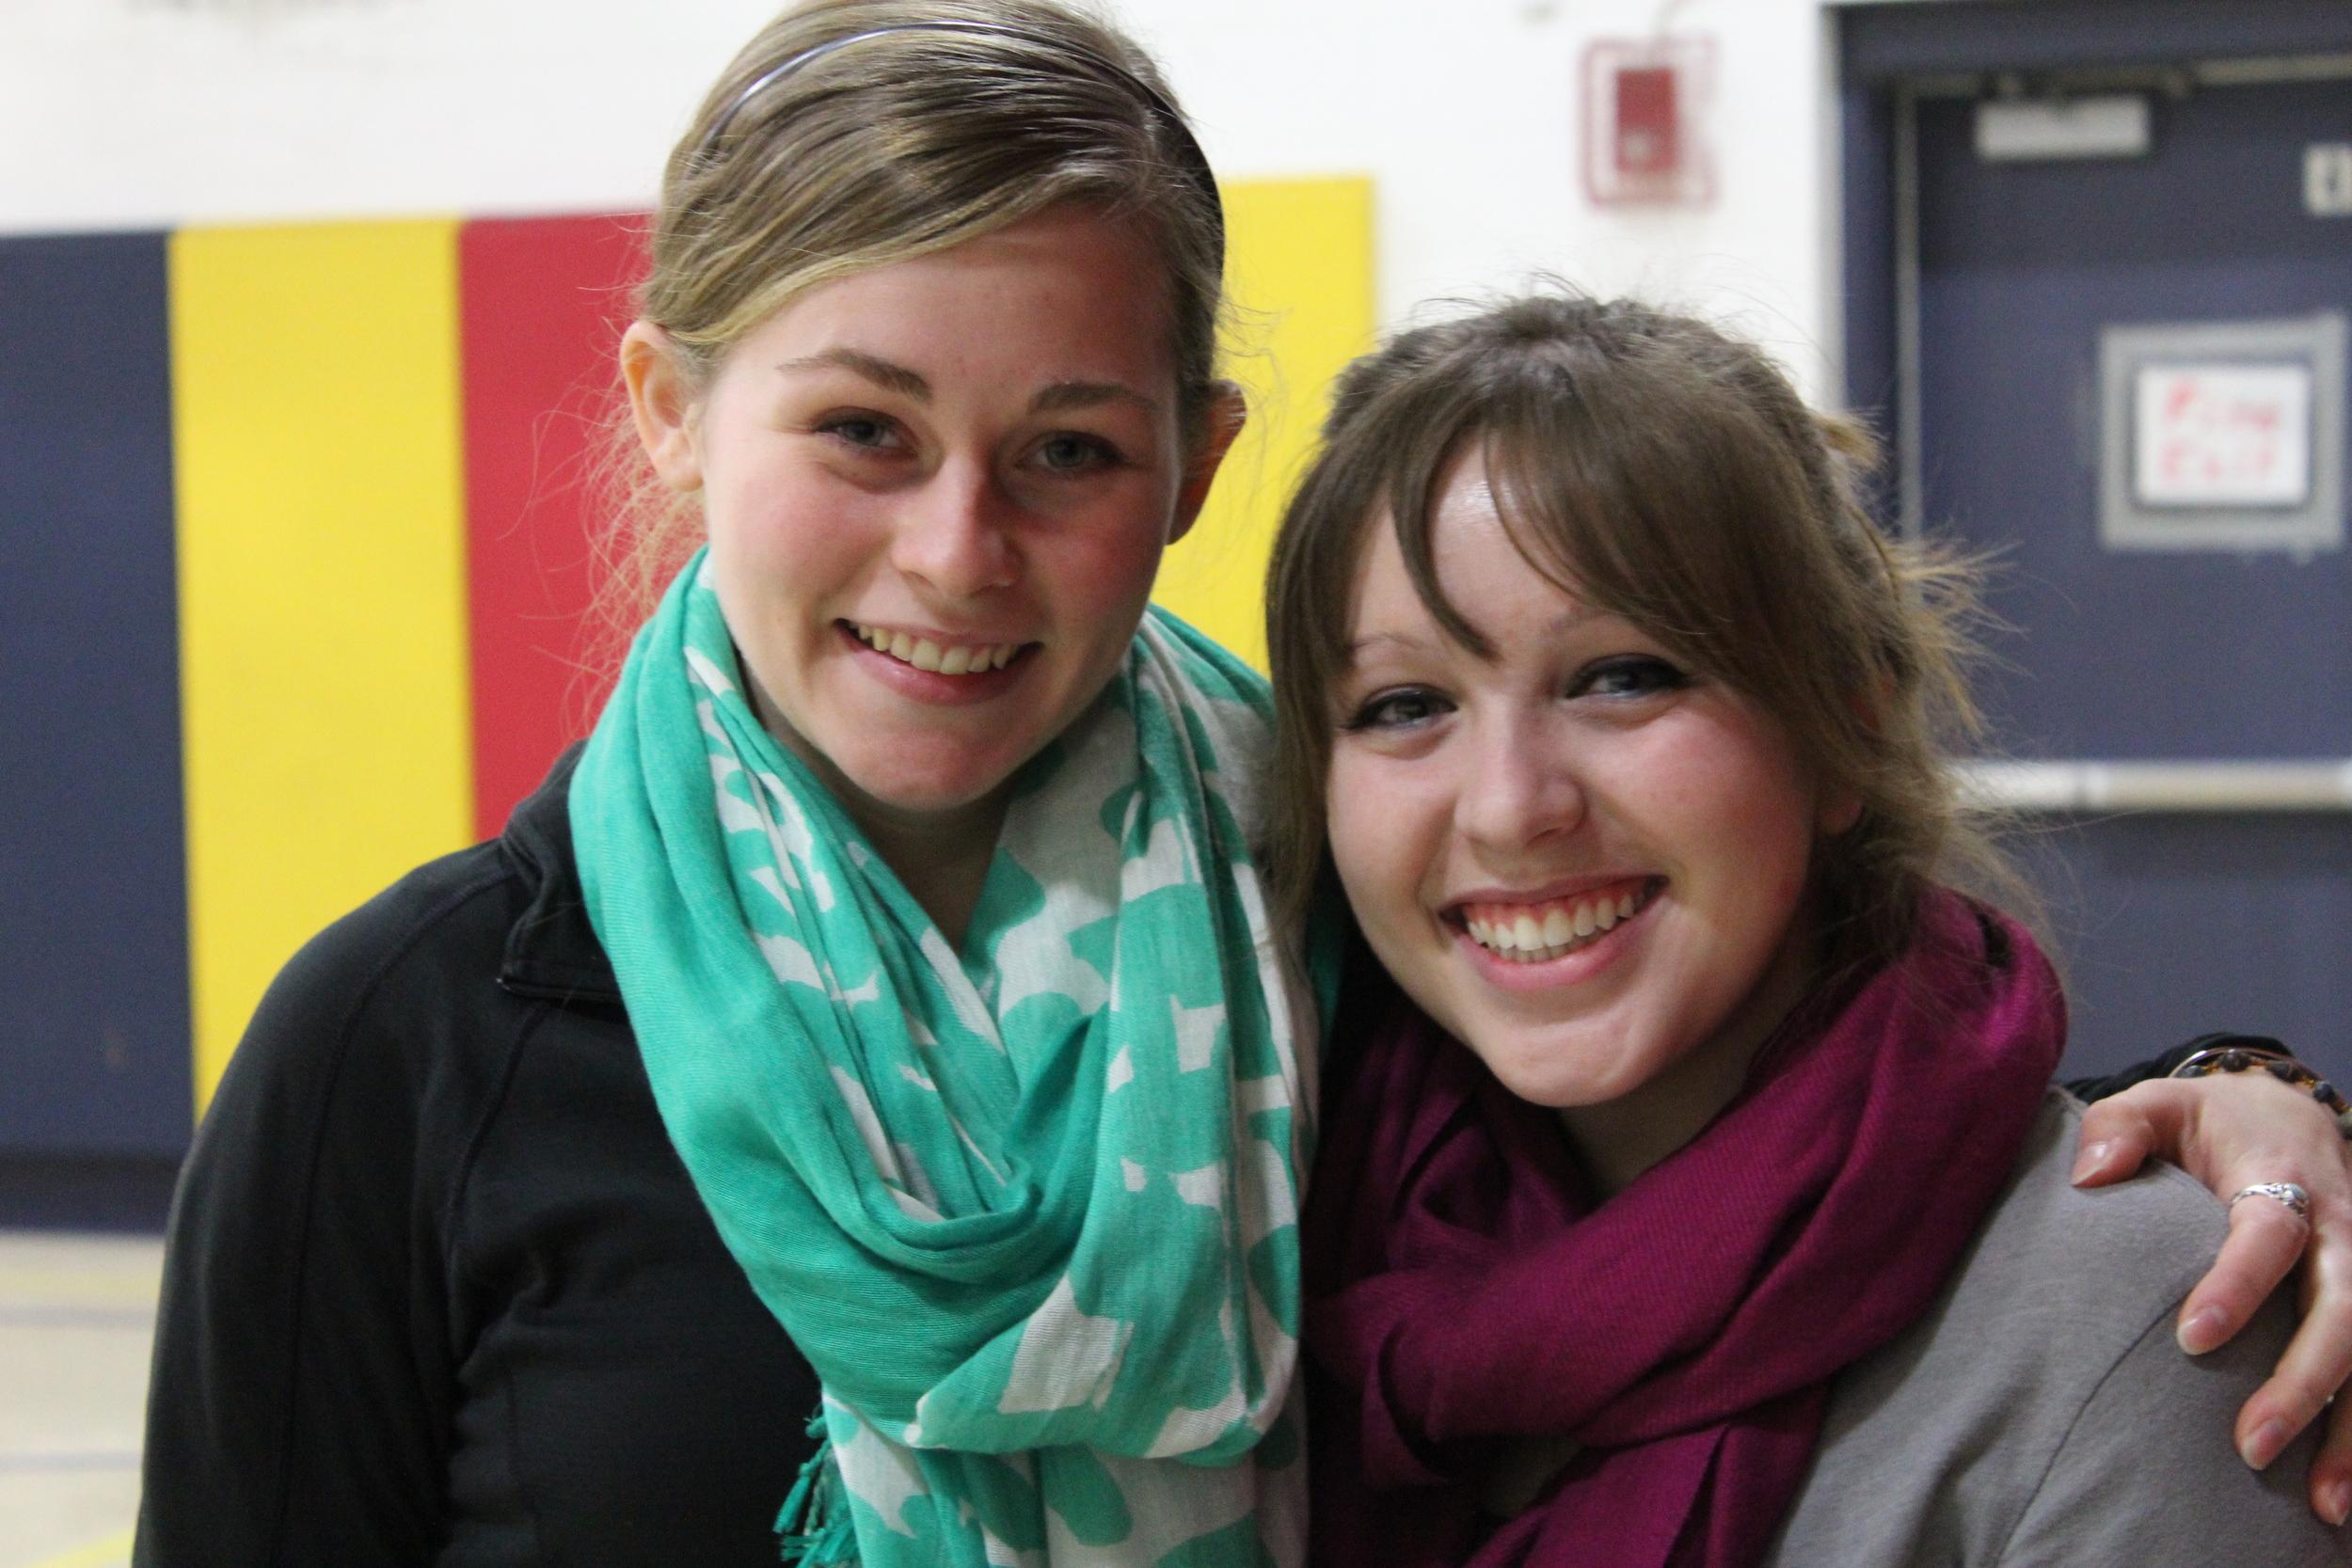 Meghan Perkins and Angelise Musterer, Endicott College